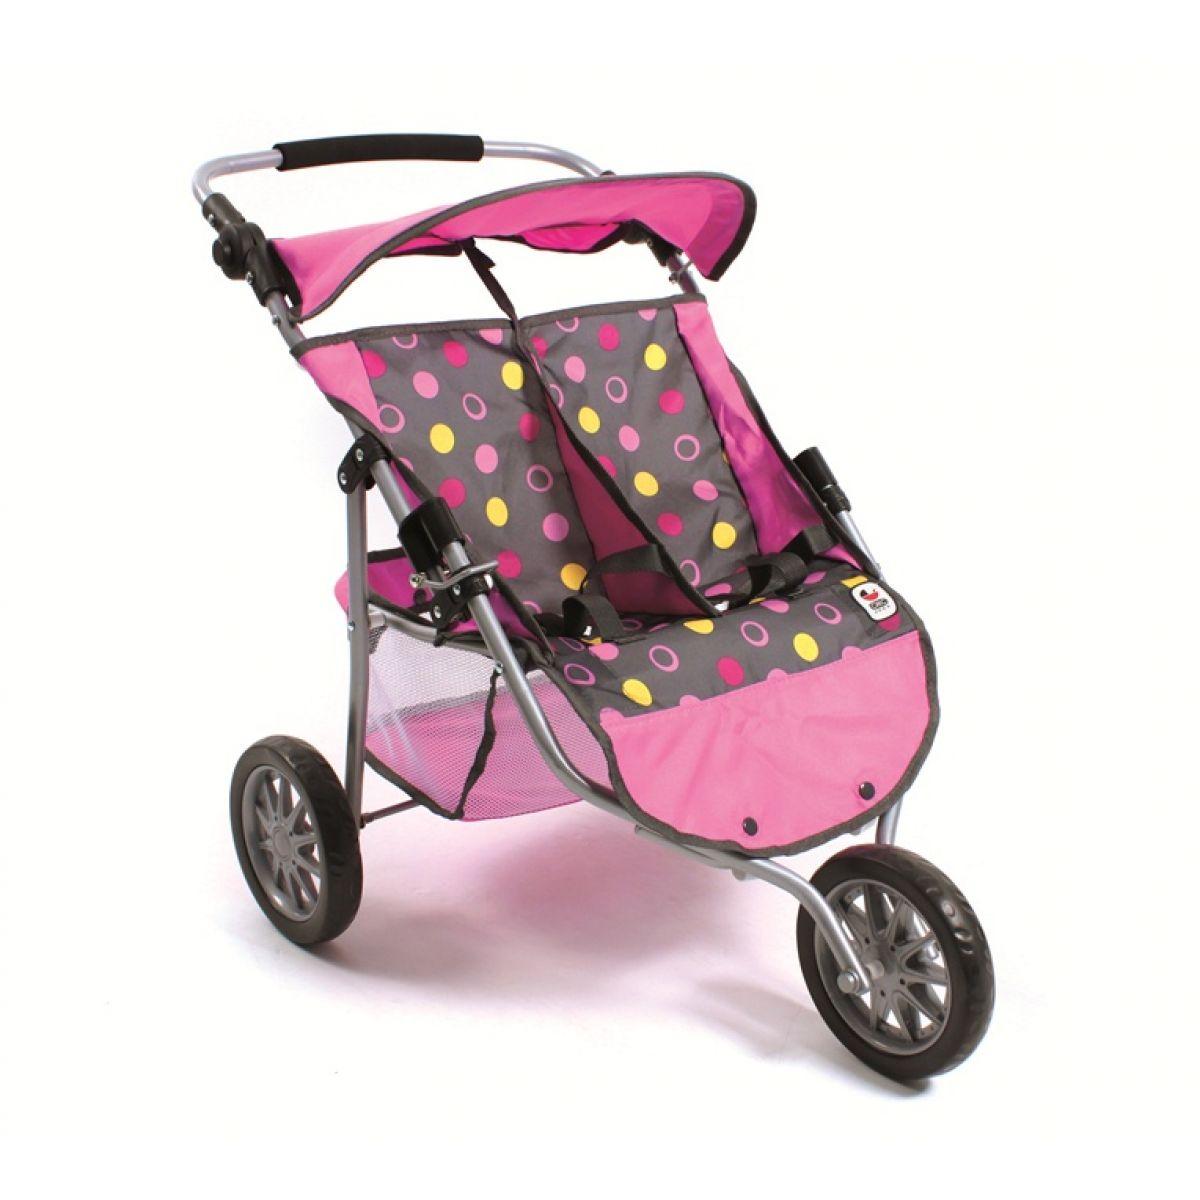 Kočárek pro dvojčata panenky JOGGER- funny pink